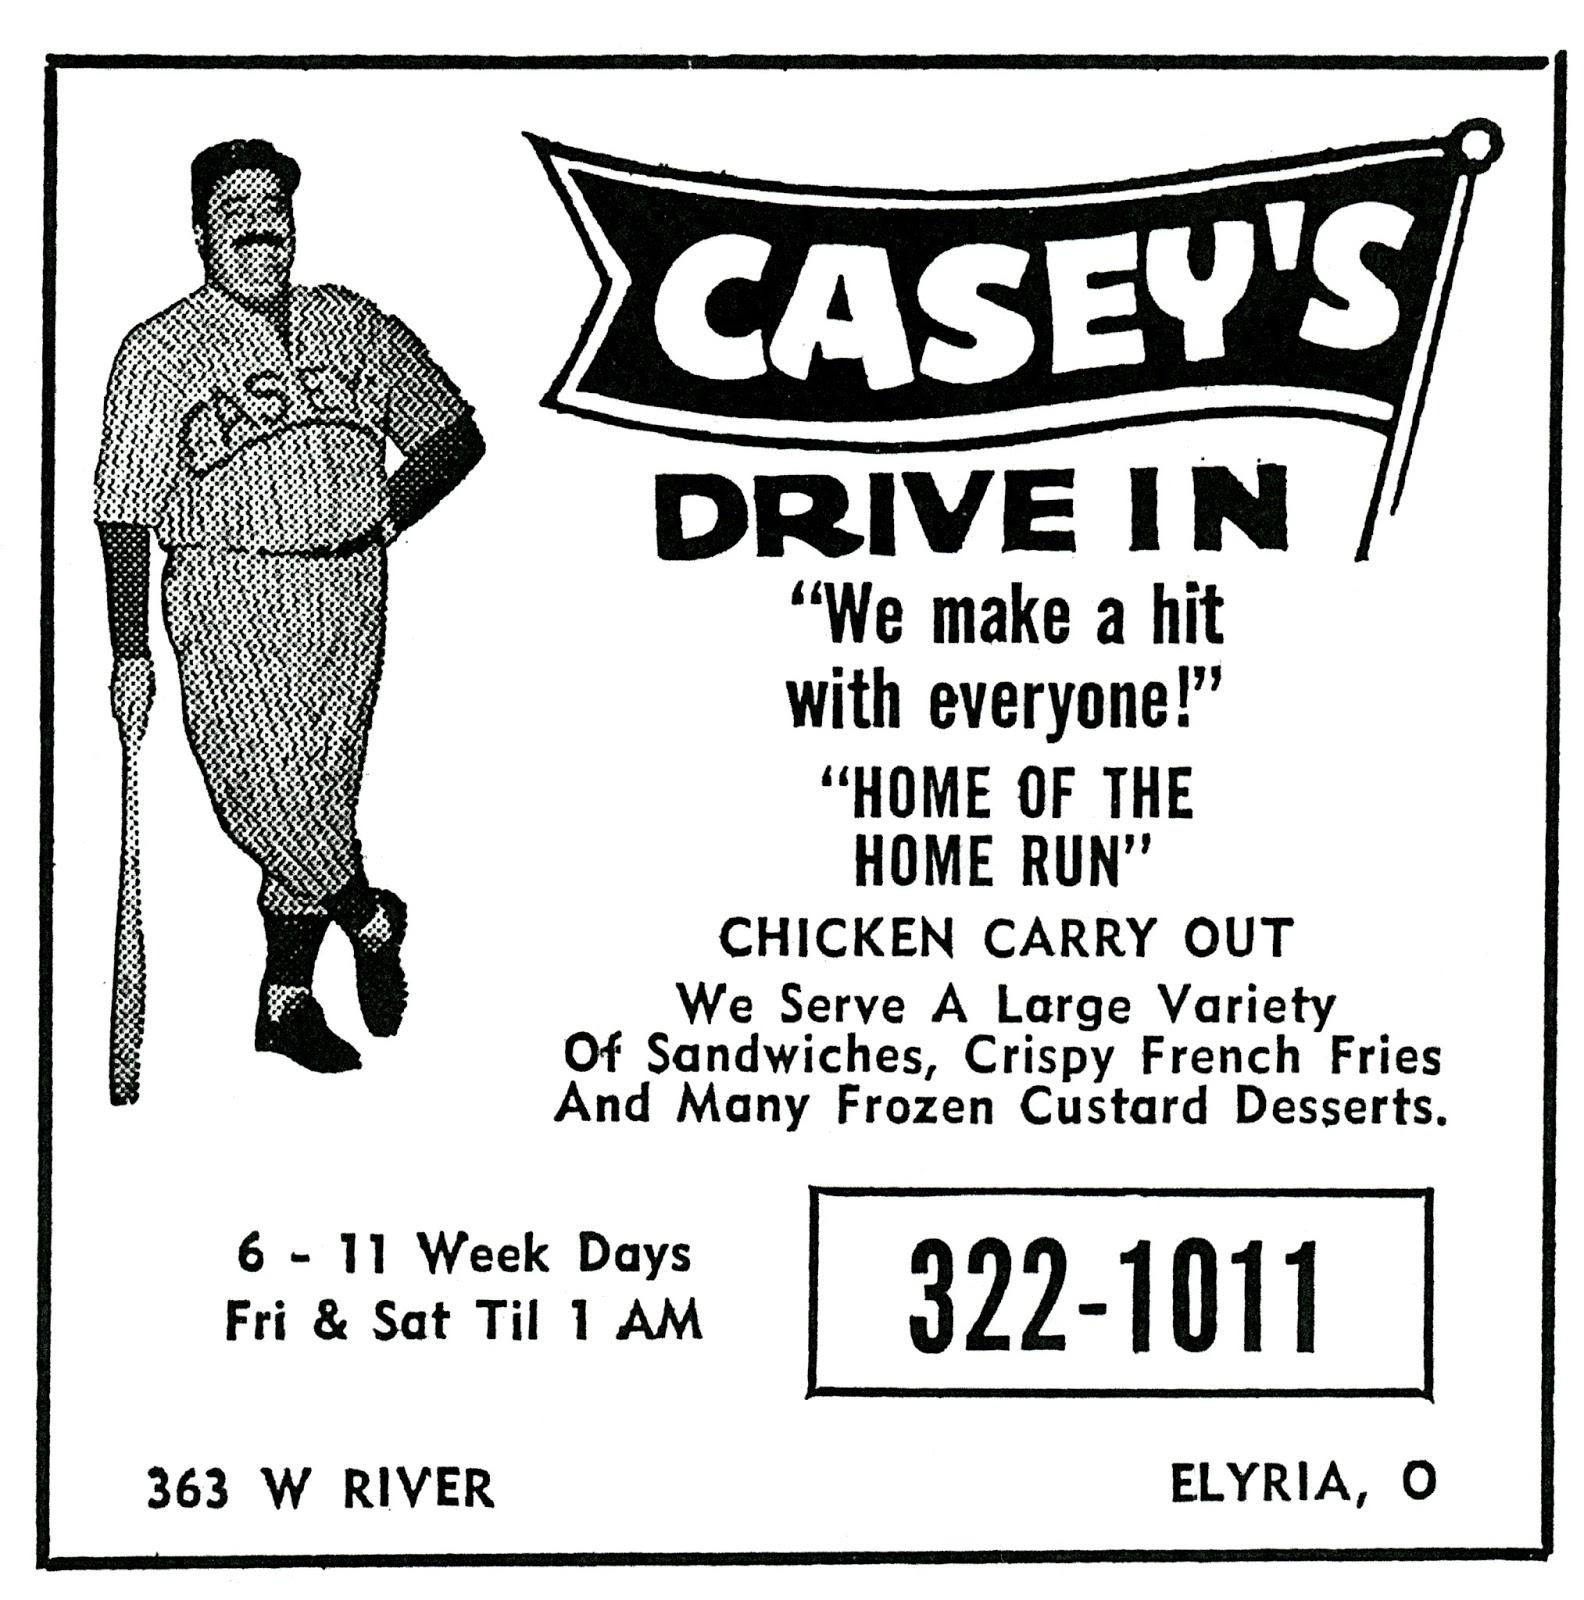 Brady's Bunch of Lorain County Nostalgia: Casey's Drive-in